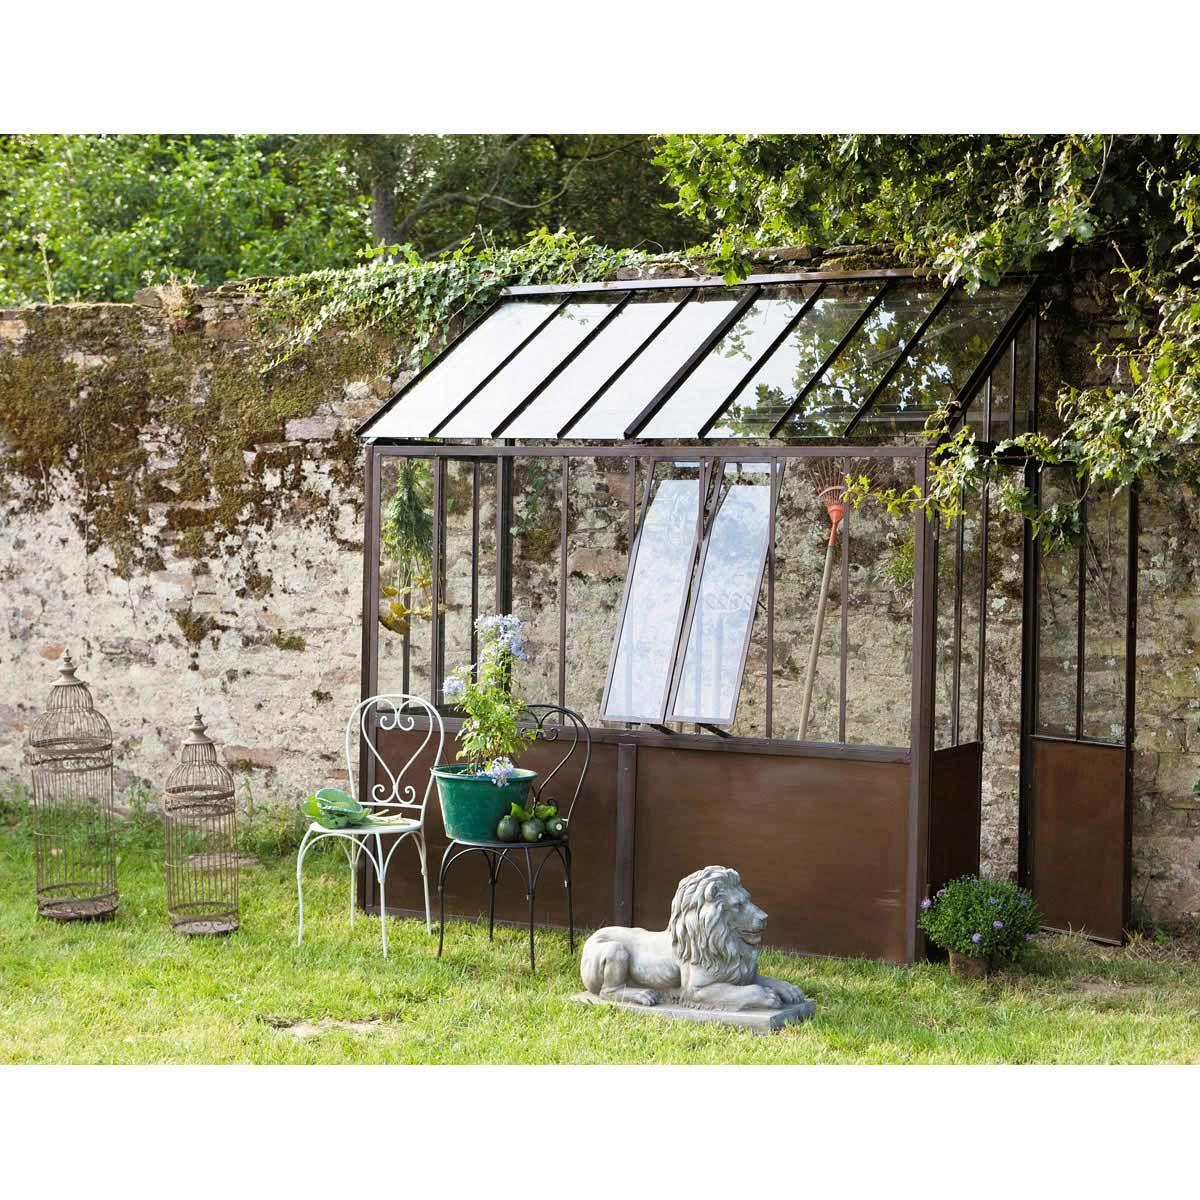 Épinglé par Gladys sur Jardin | Greenhouse gardening, Garden chairs ...